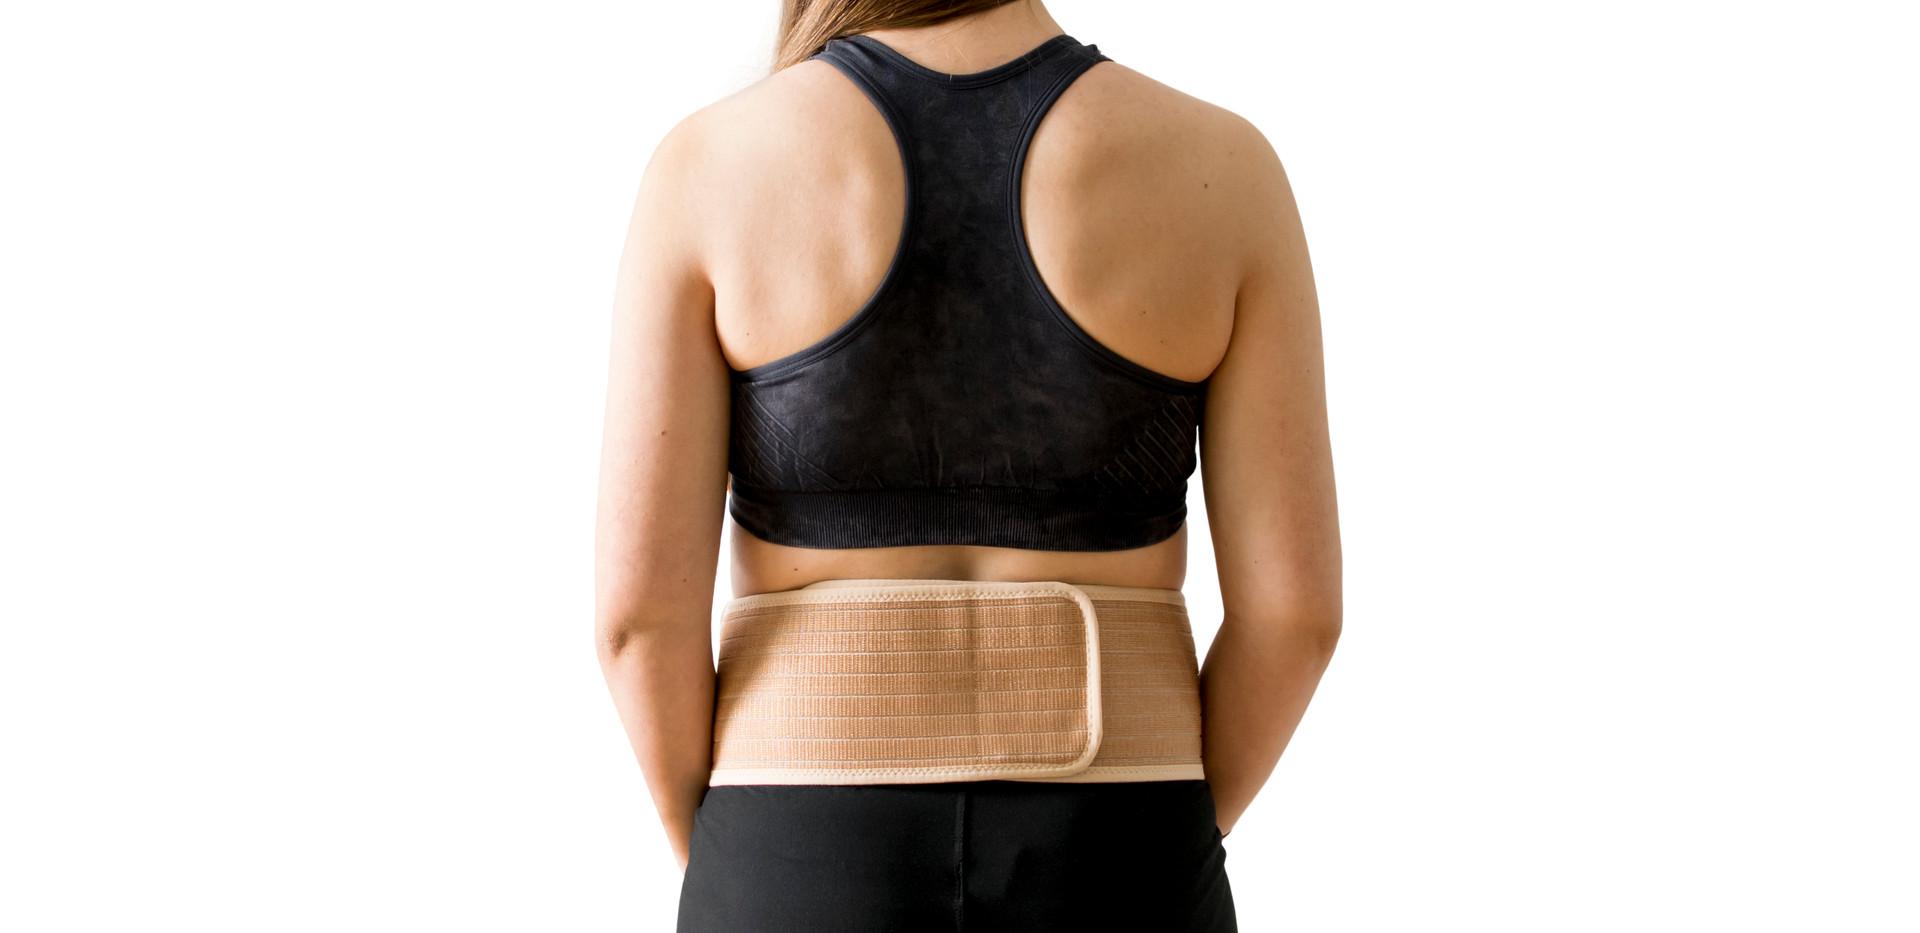 Easily adjustable Velcro strap